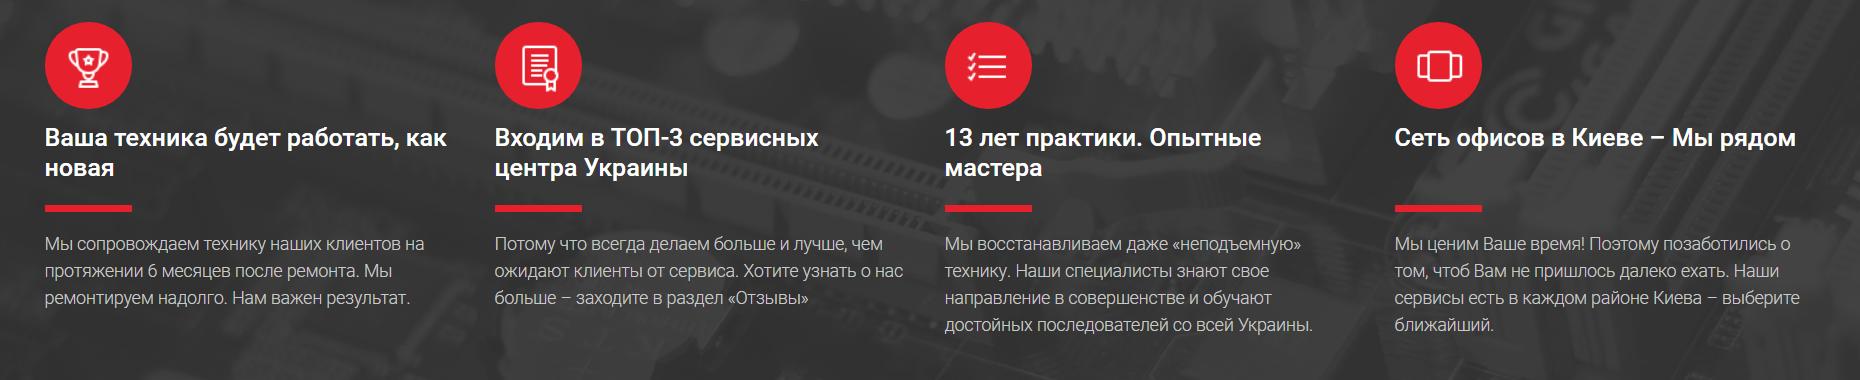 joxi_screenshot_1509015841161